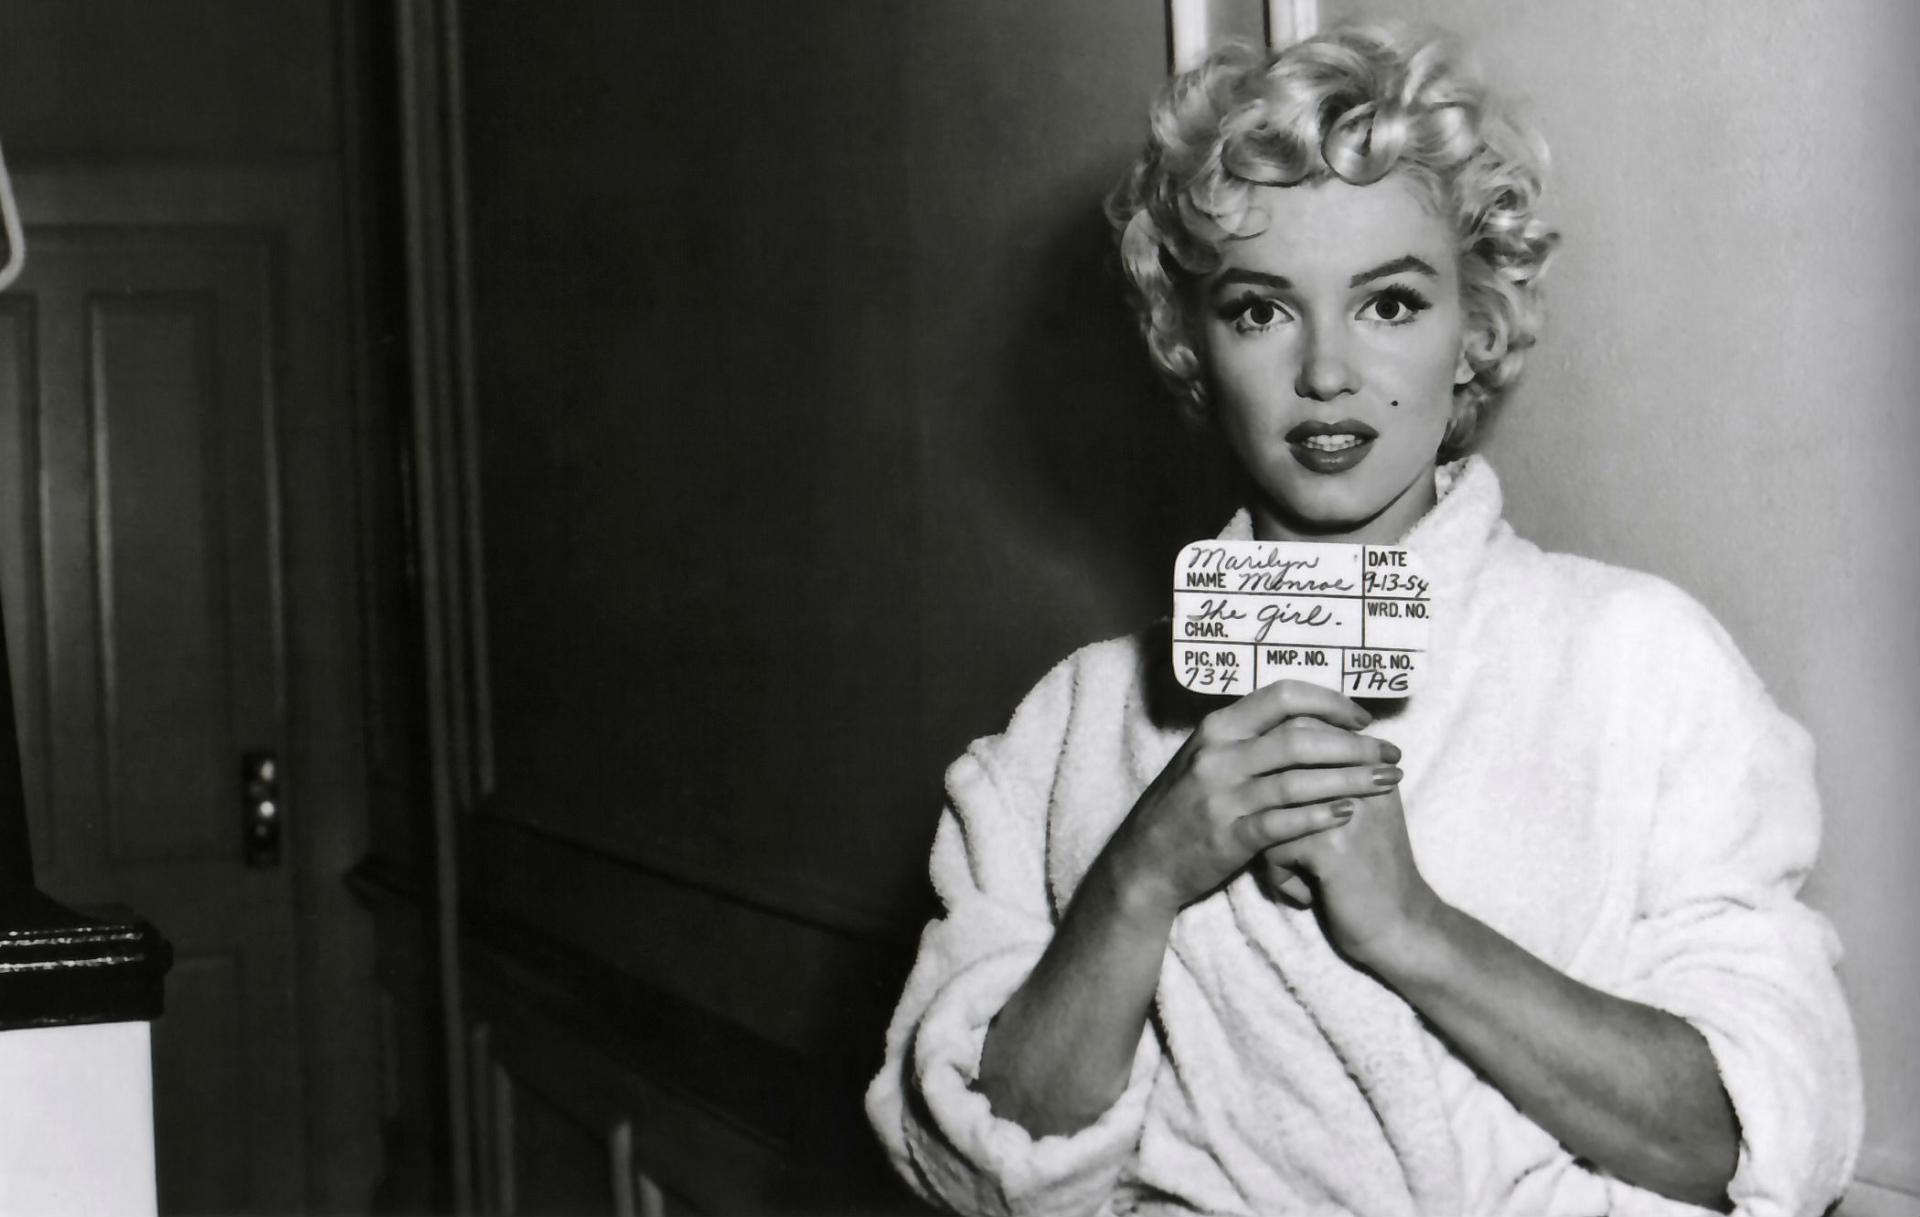 Black And White Pin Up Girl Wallpaper Marilyn Monroe Fondos De Pantalla De Marilyn Monroe